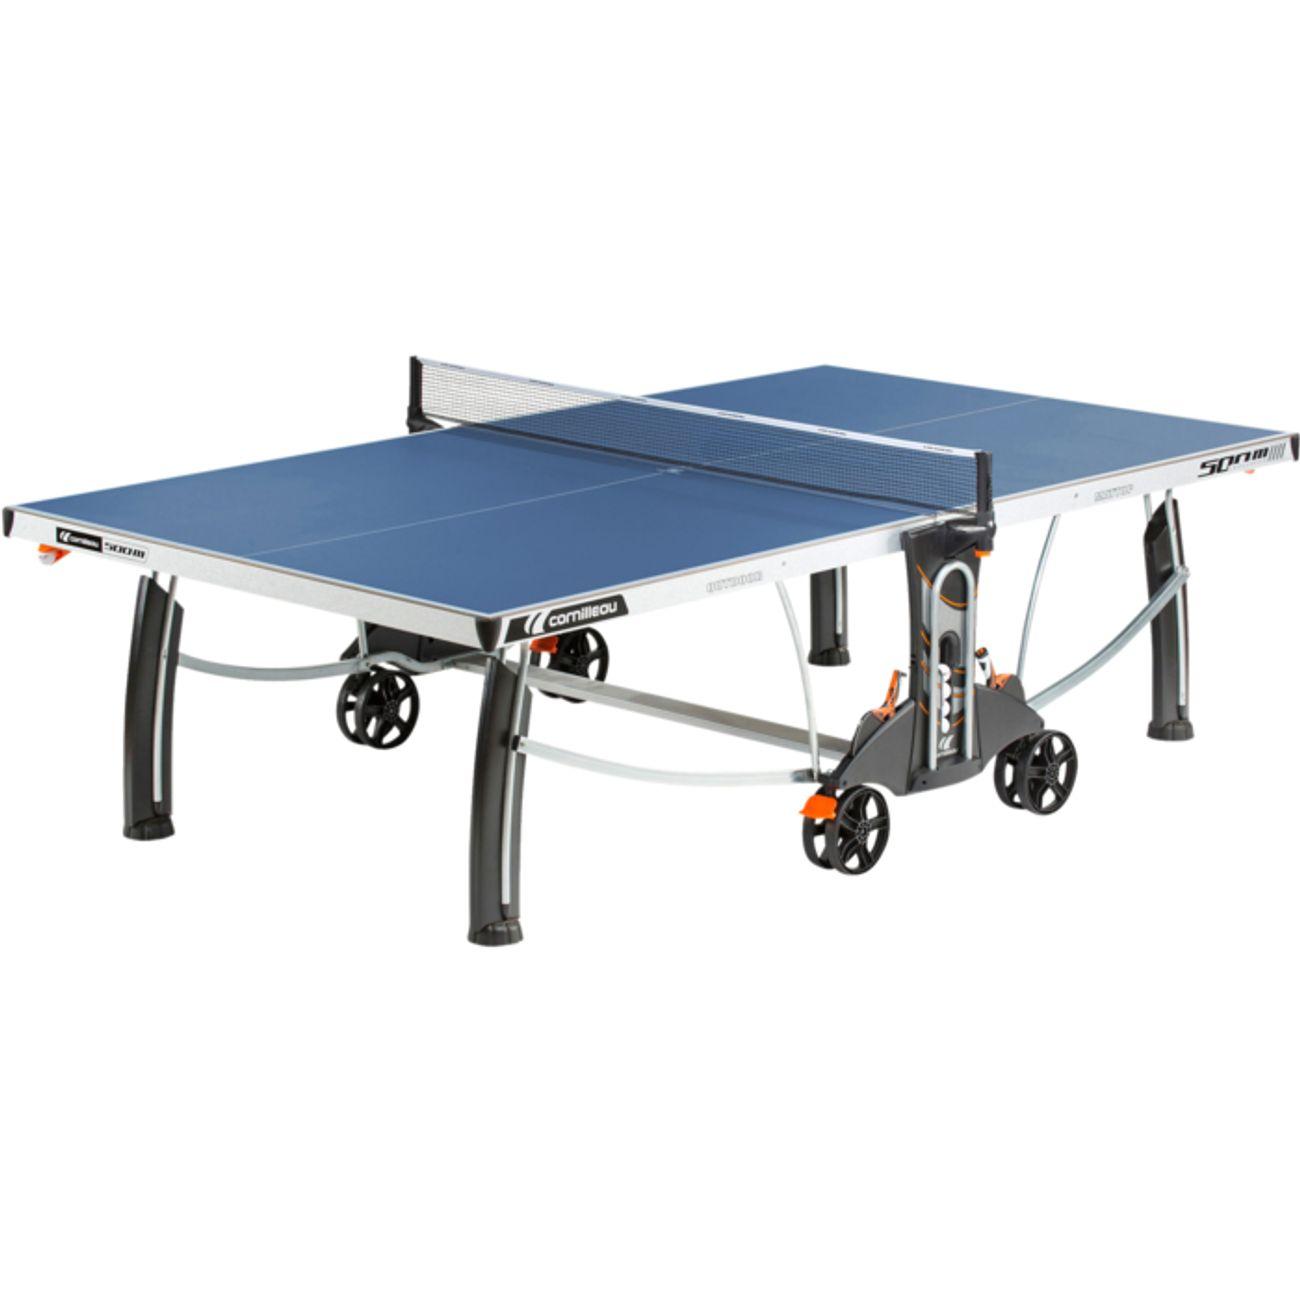 TABLE DE TENNIS DE TABLE   CORNILLEAU TABLE 500 M CROSSOVER